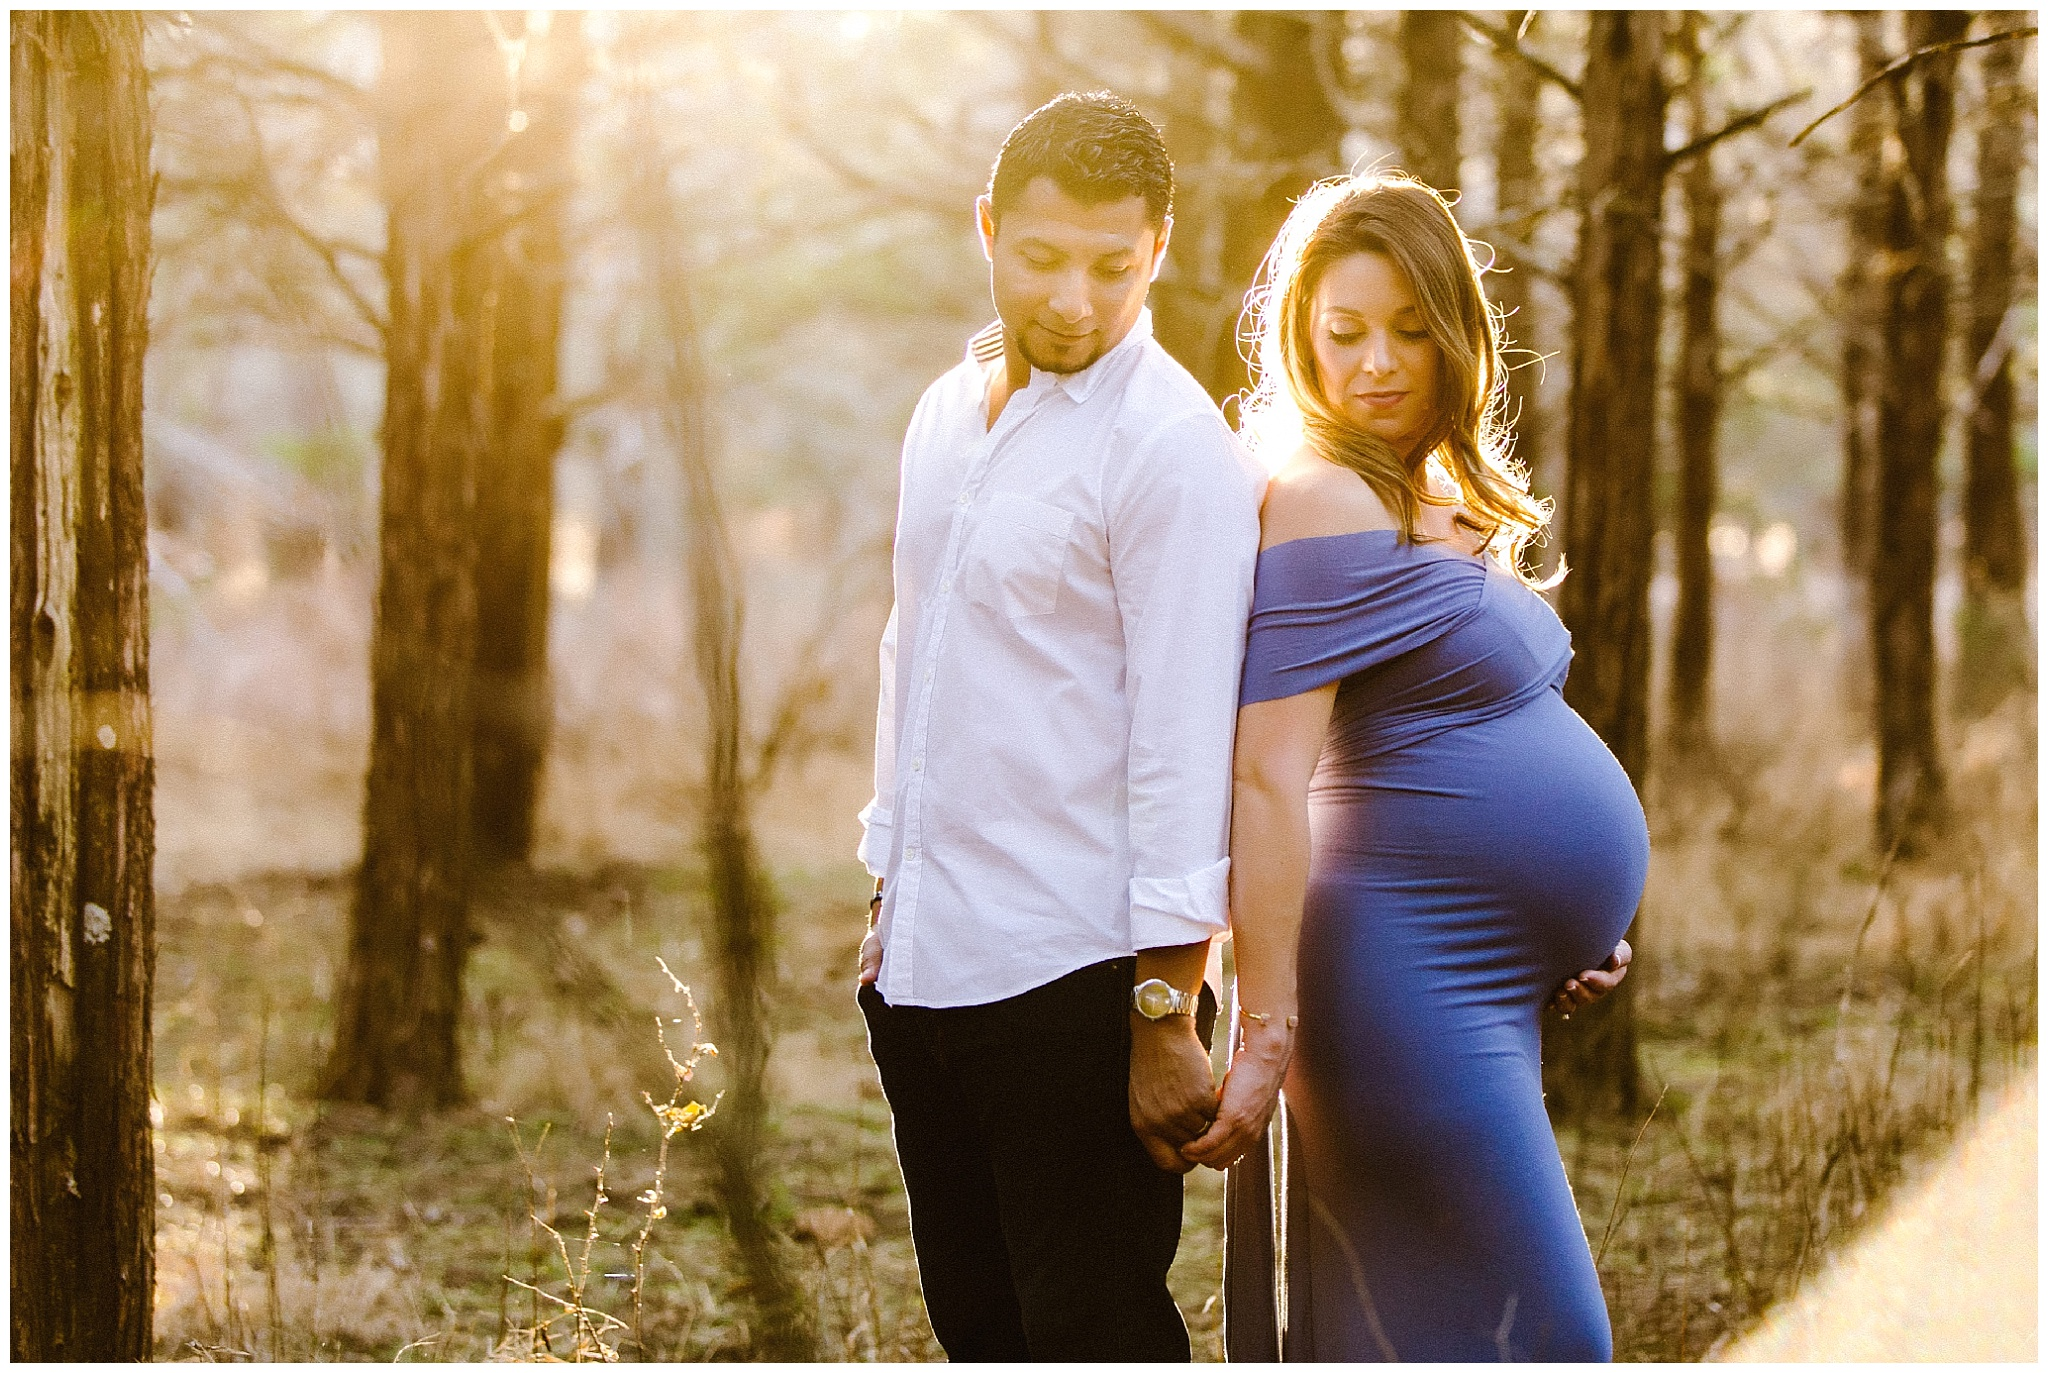 Wichita Mountains Wildlife Refuge – Lawton, OK Maternity